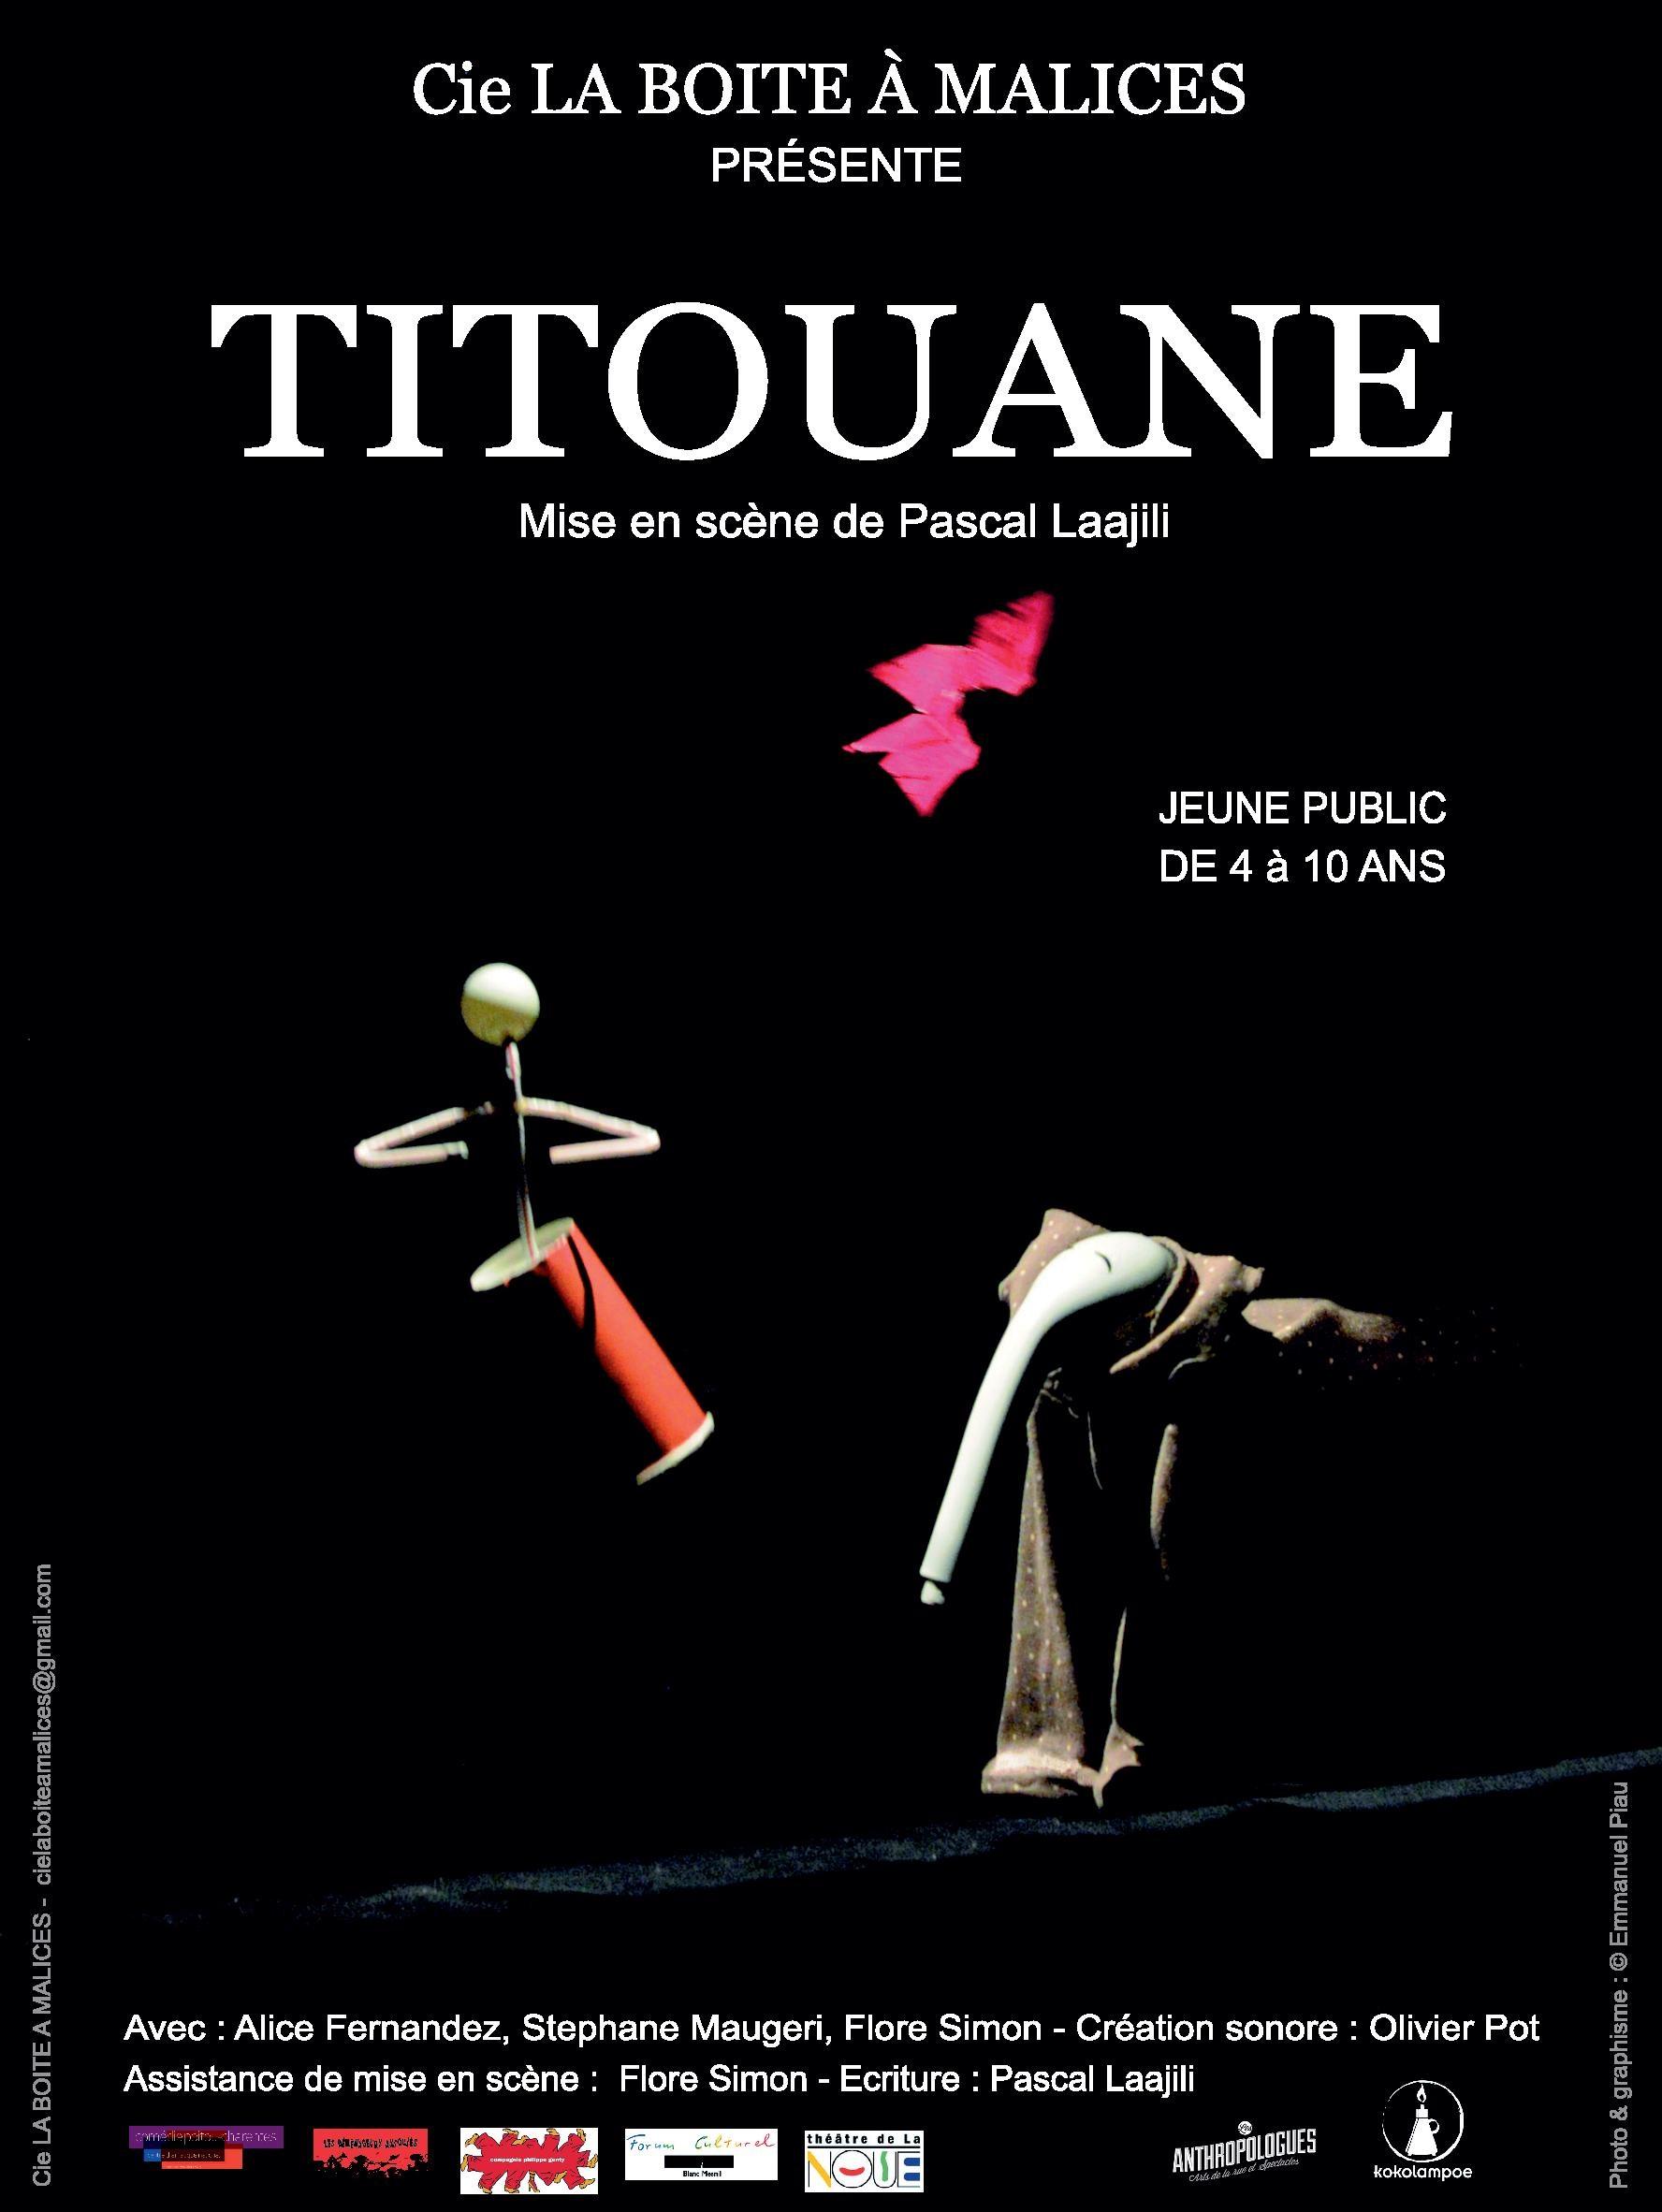 Titouane - La boîte à malices © Emmanuel Piau